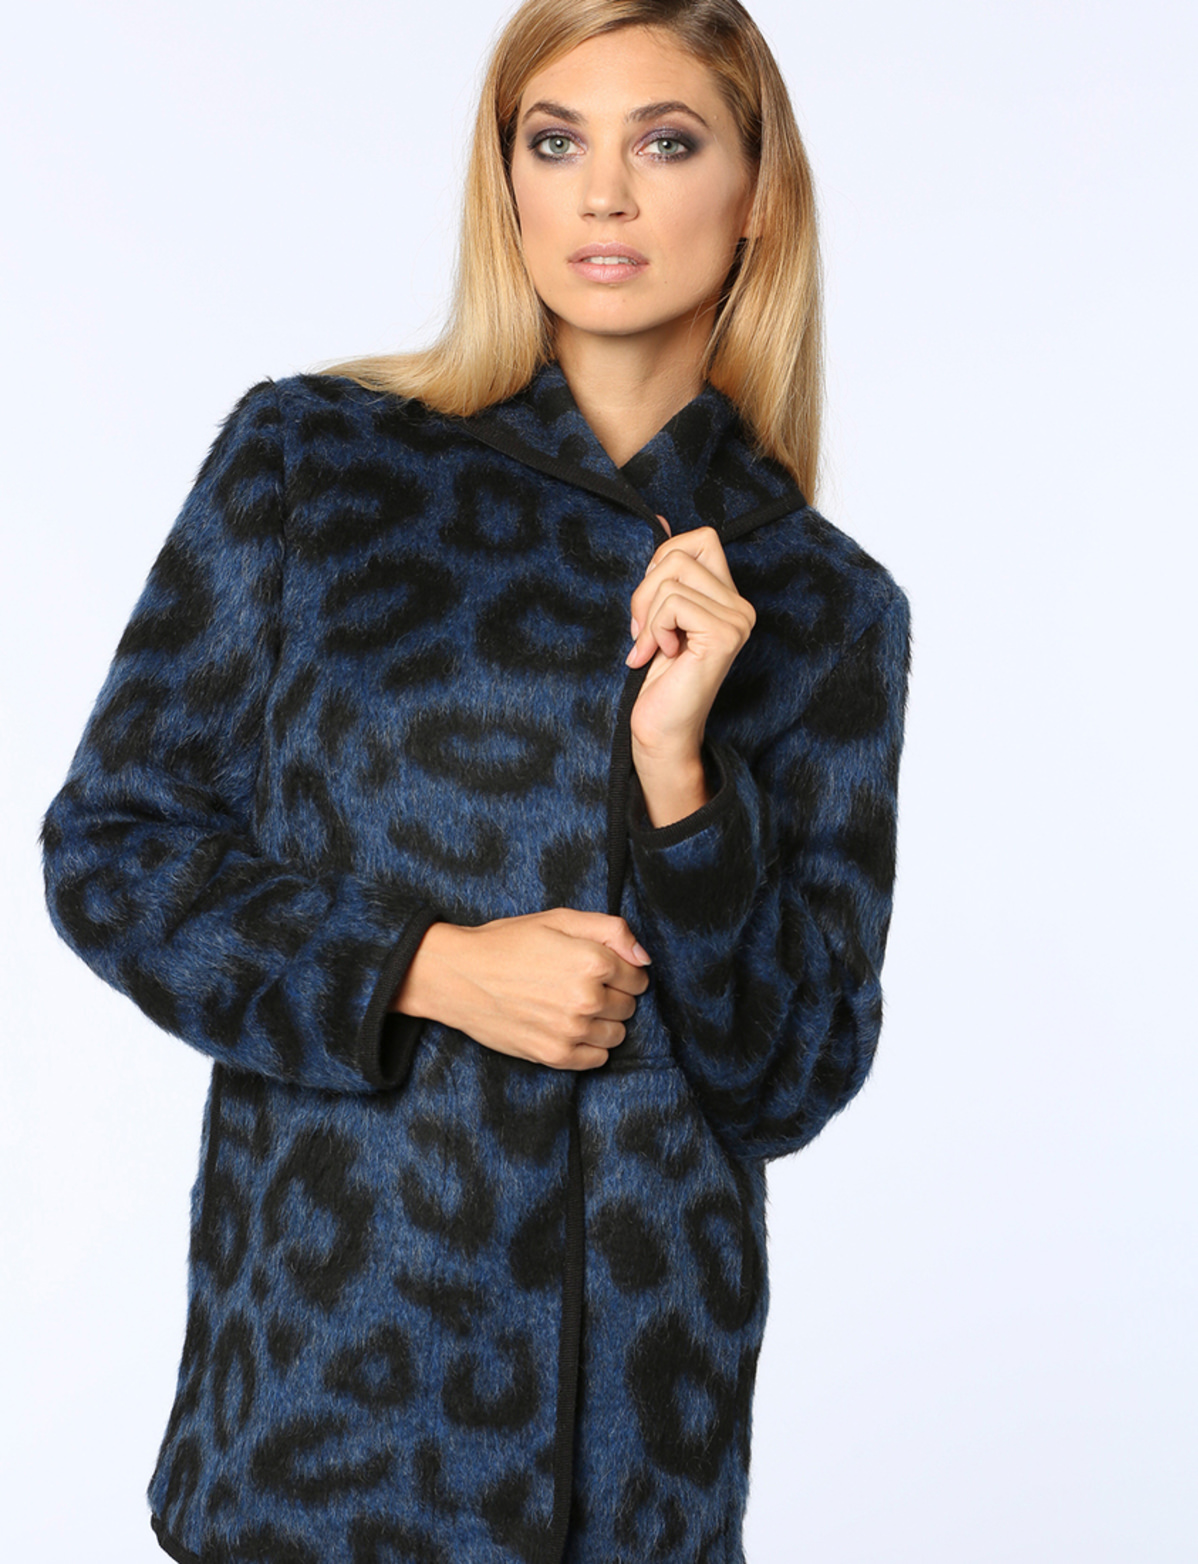 4d643bb0db30 John in Blau jetzt im Jones Onlineshop kaufen | Jones Fashion